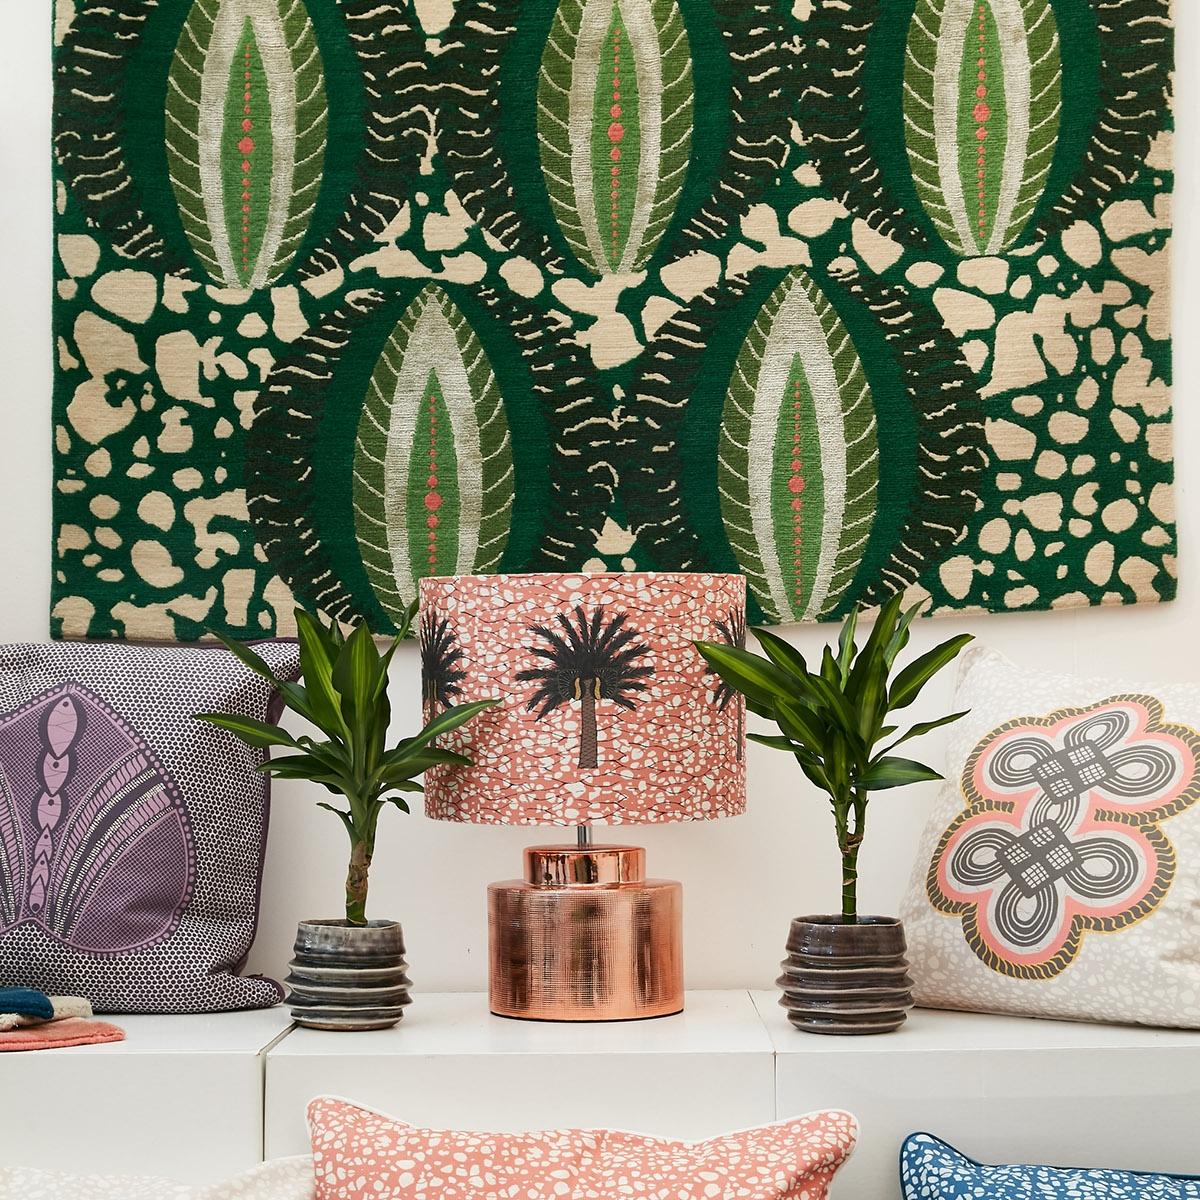 Sophie Robinson interviews textile designer Eva Sonaike. She shares her journey from journalist to designer and her inspirations. #sophierobinson #designerspotlight #evasonaike